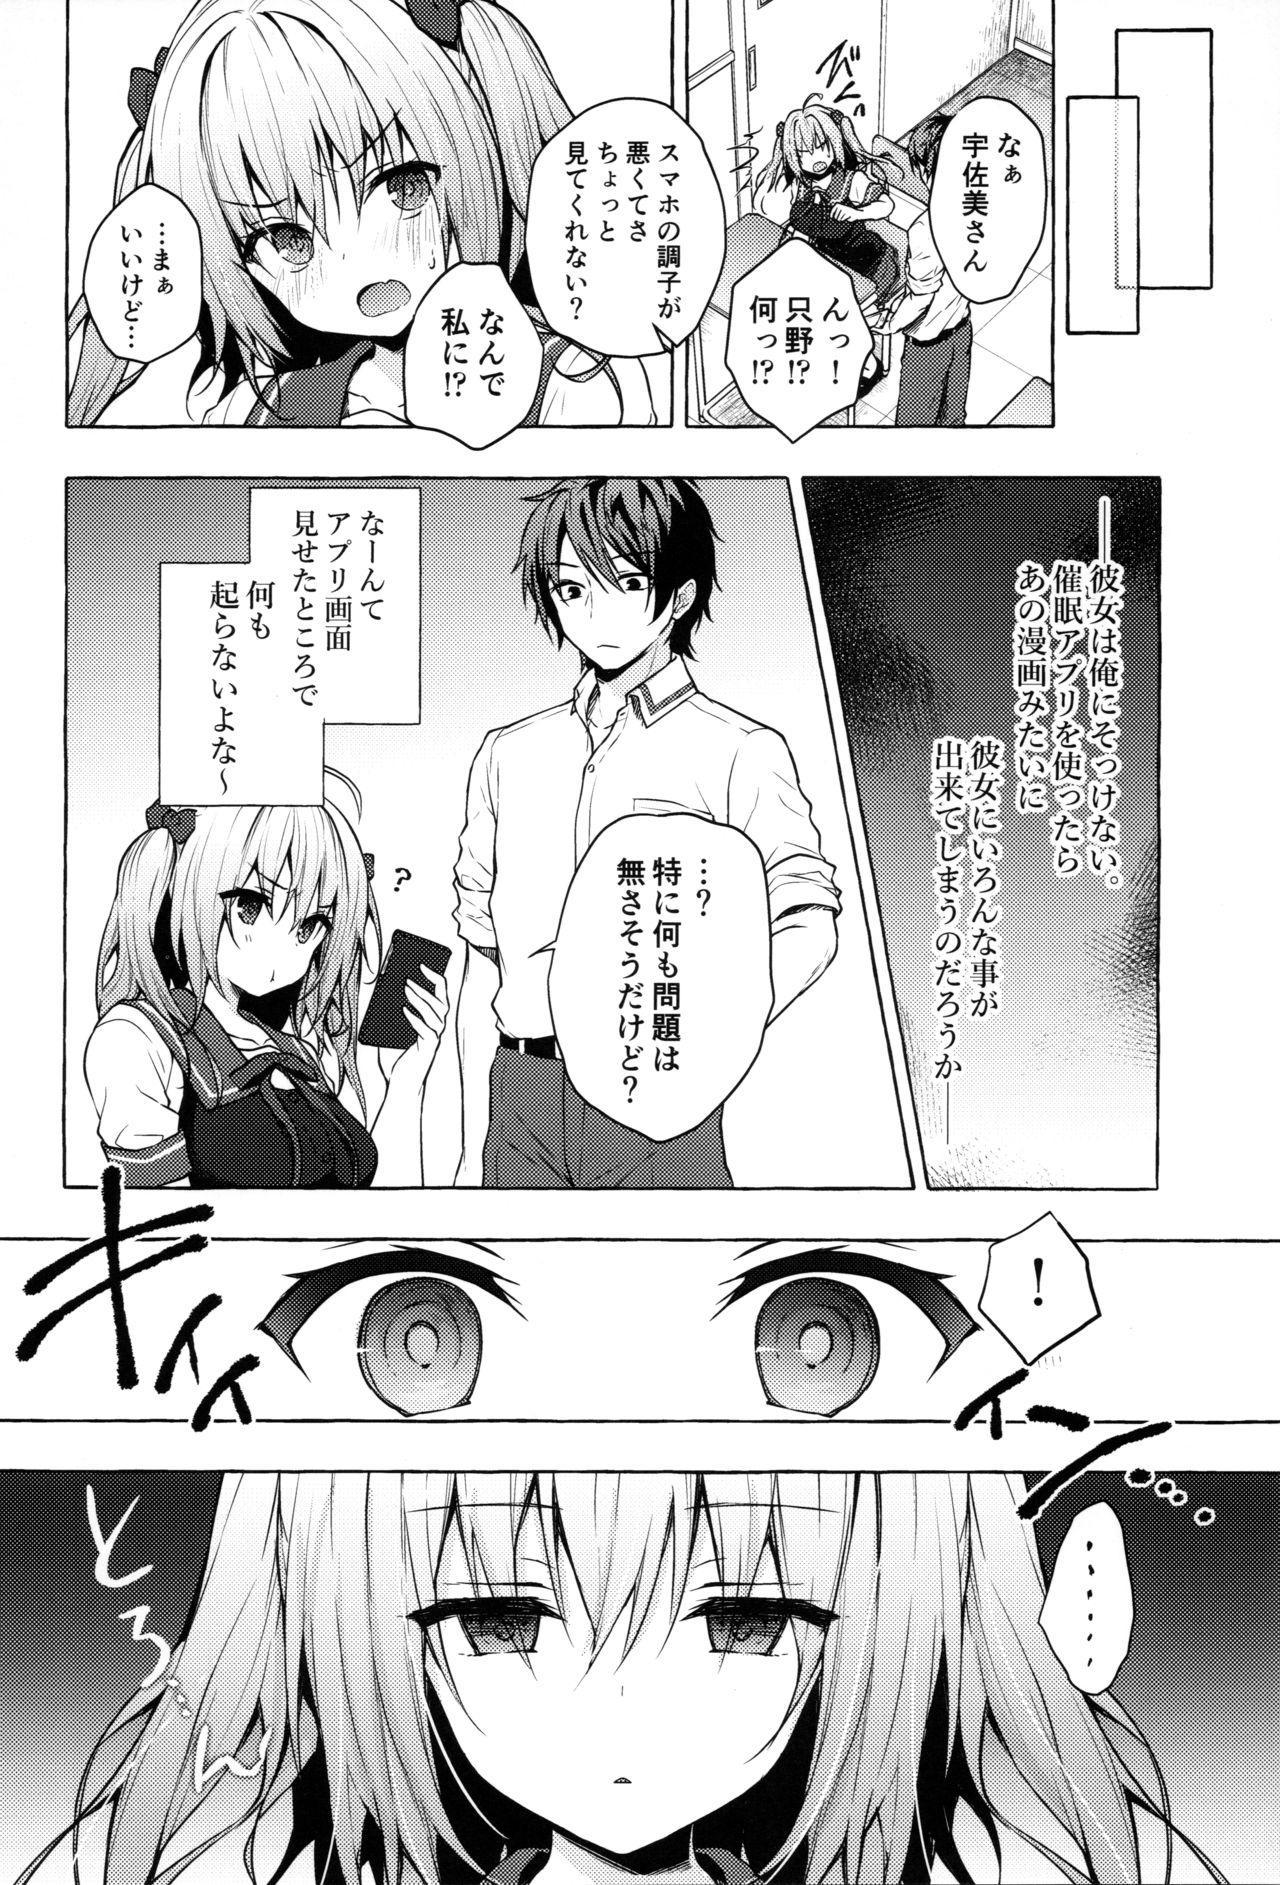 (C96) [Kinokonomi (konomi)] Saimin Usami-san -Nyancologism 2- 4